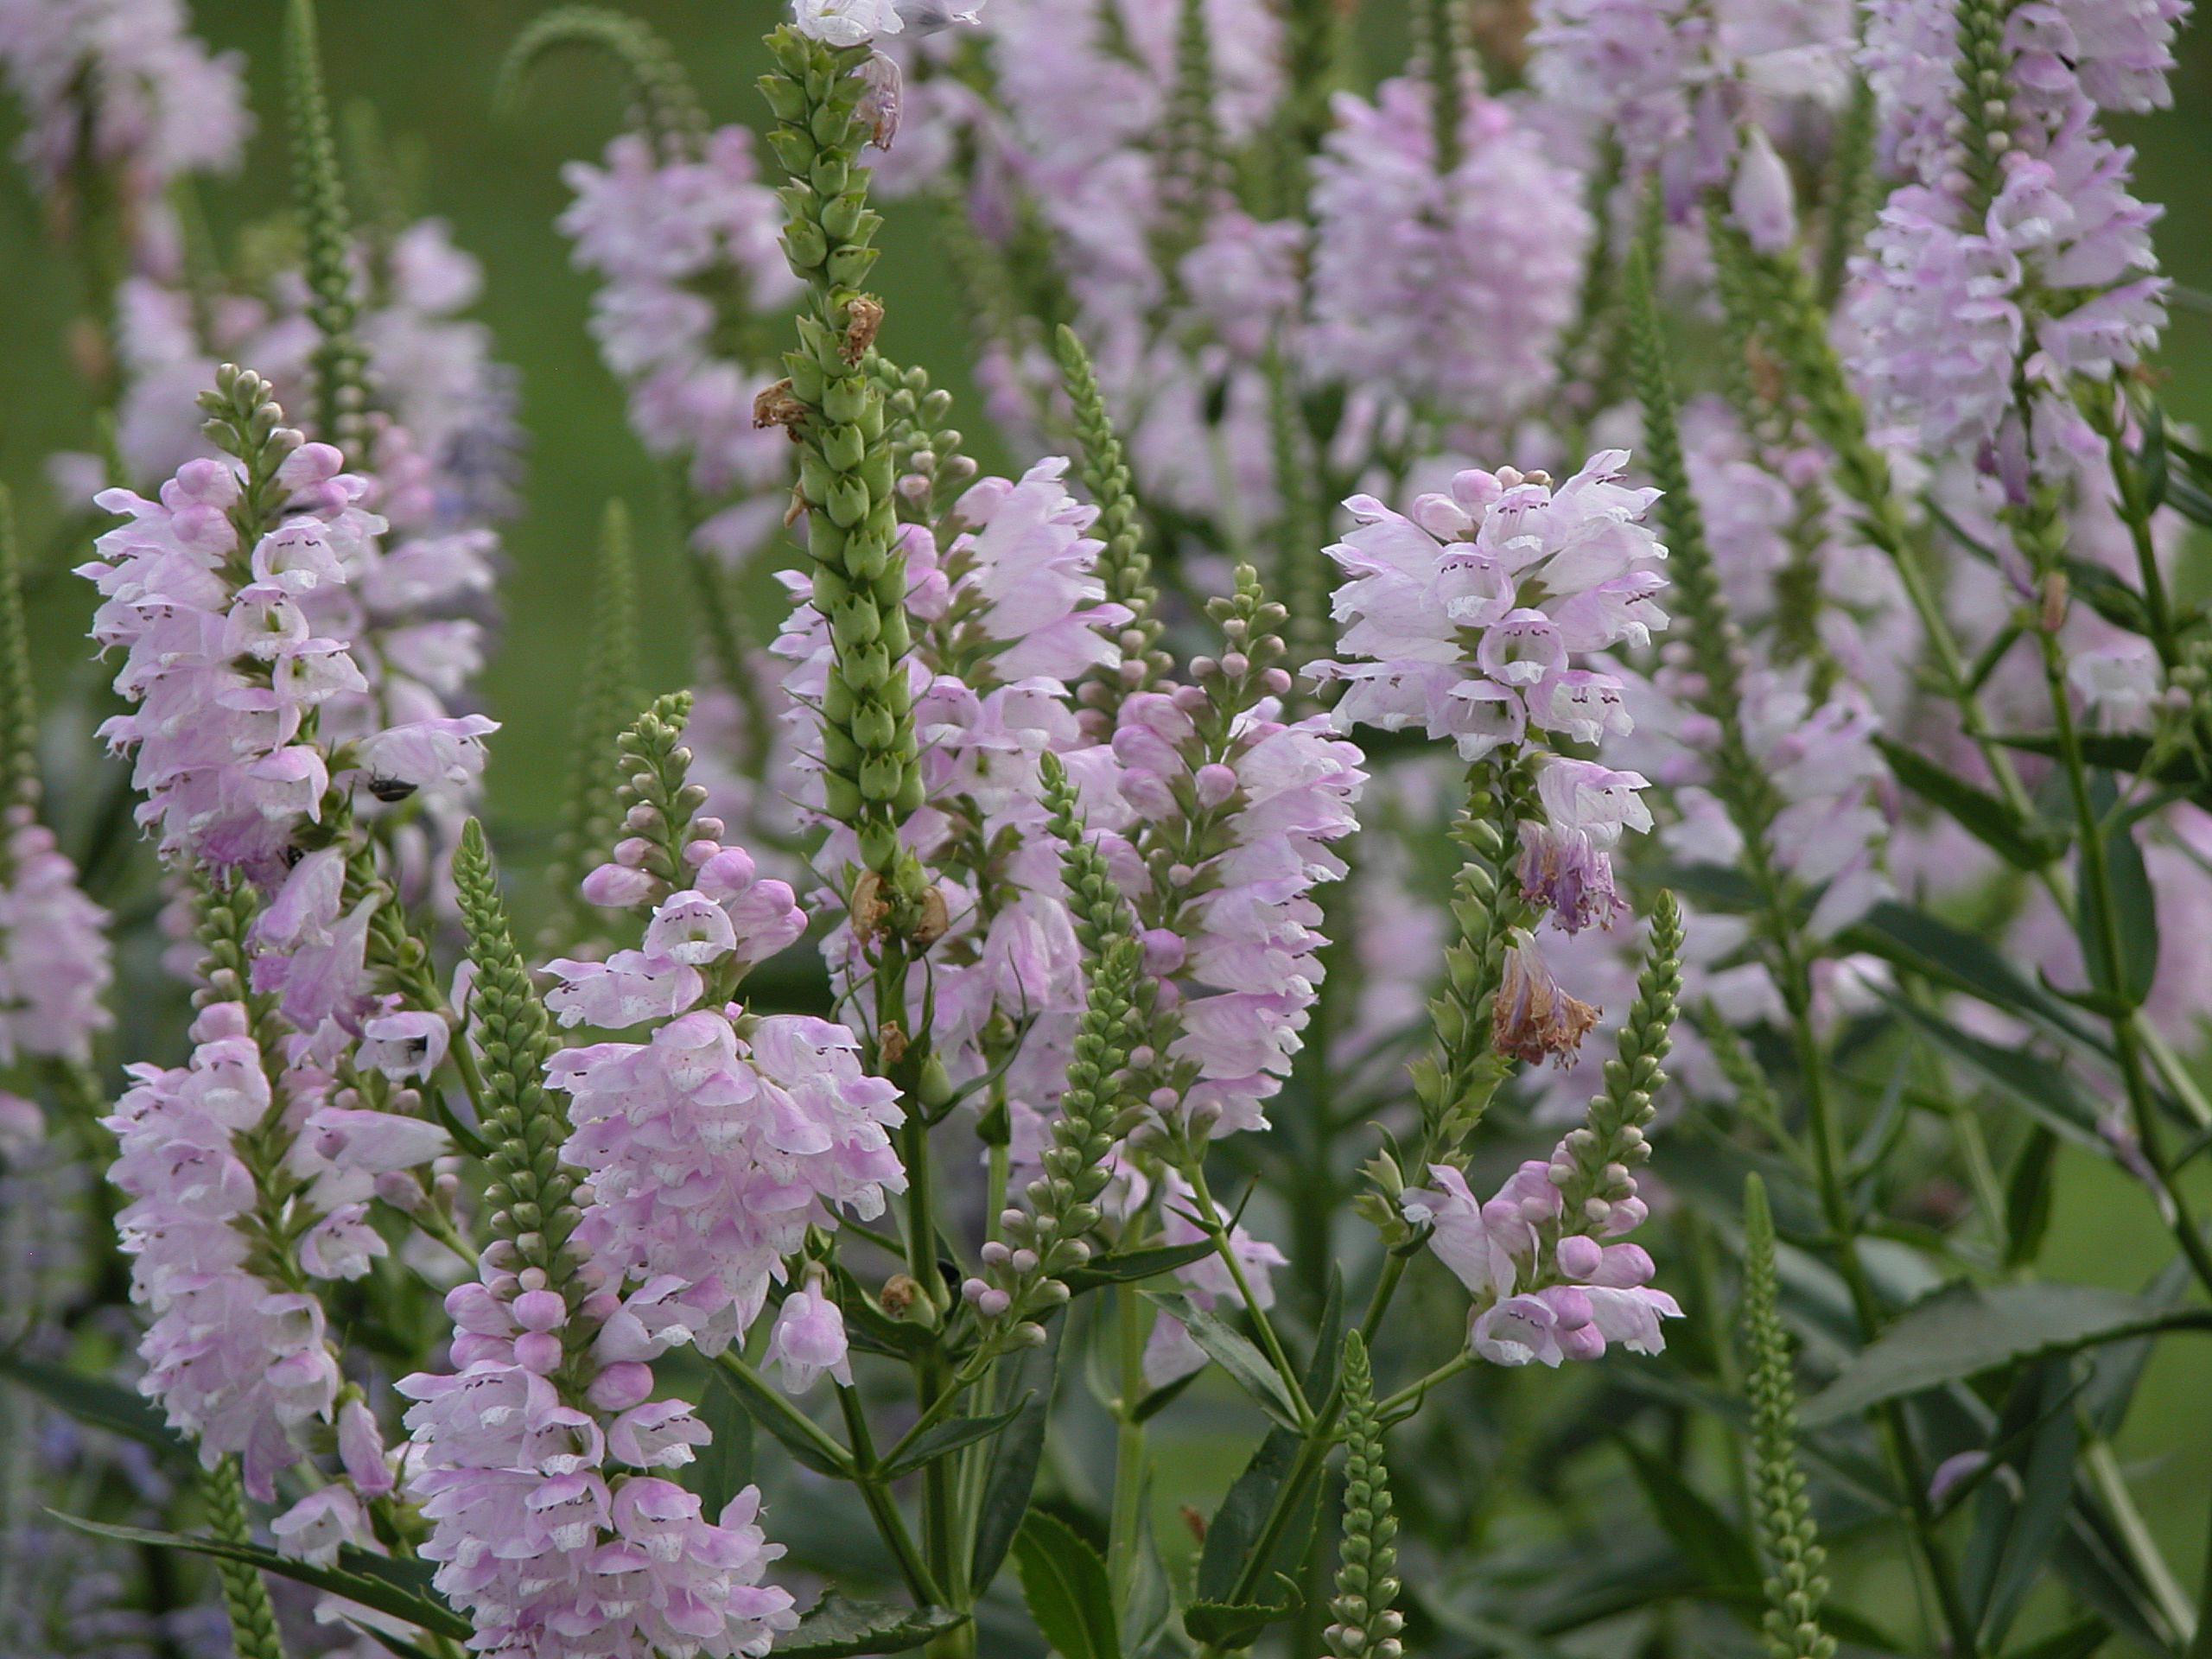 Growing Obedient Plant Or False Dragonhead